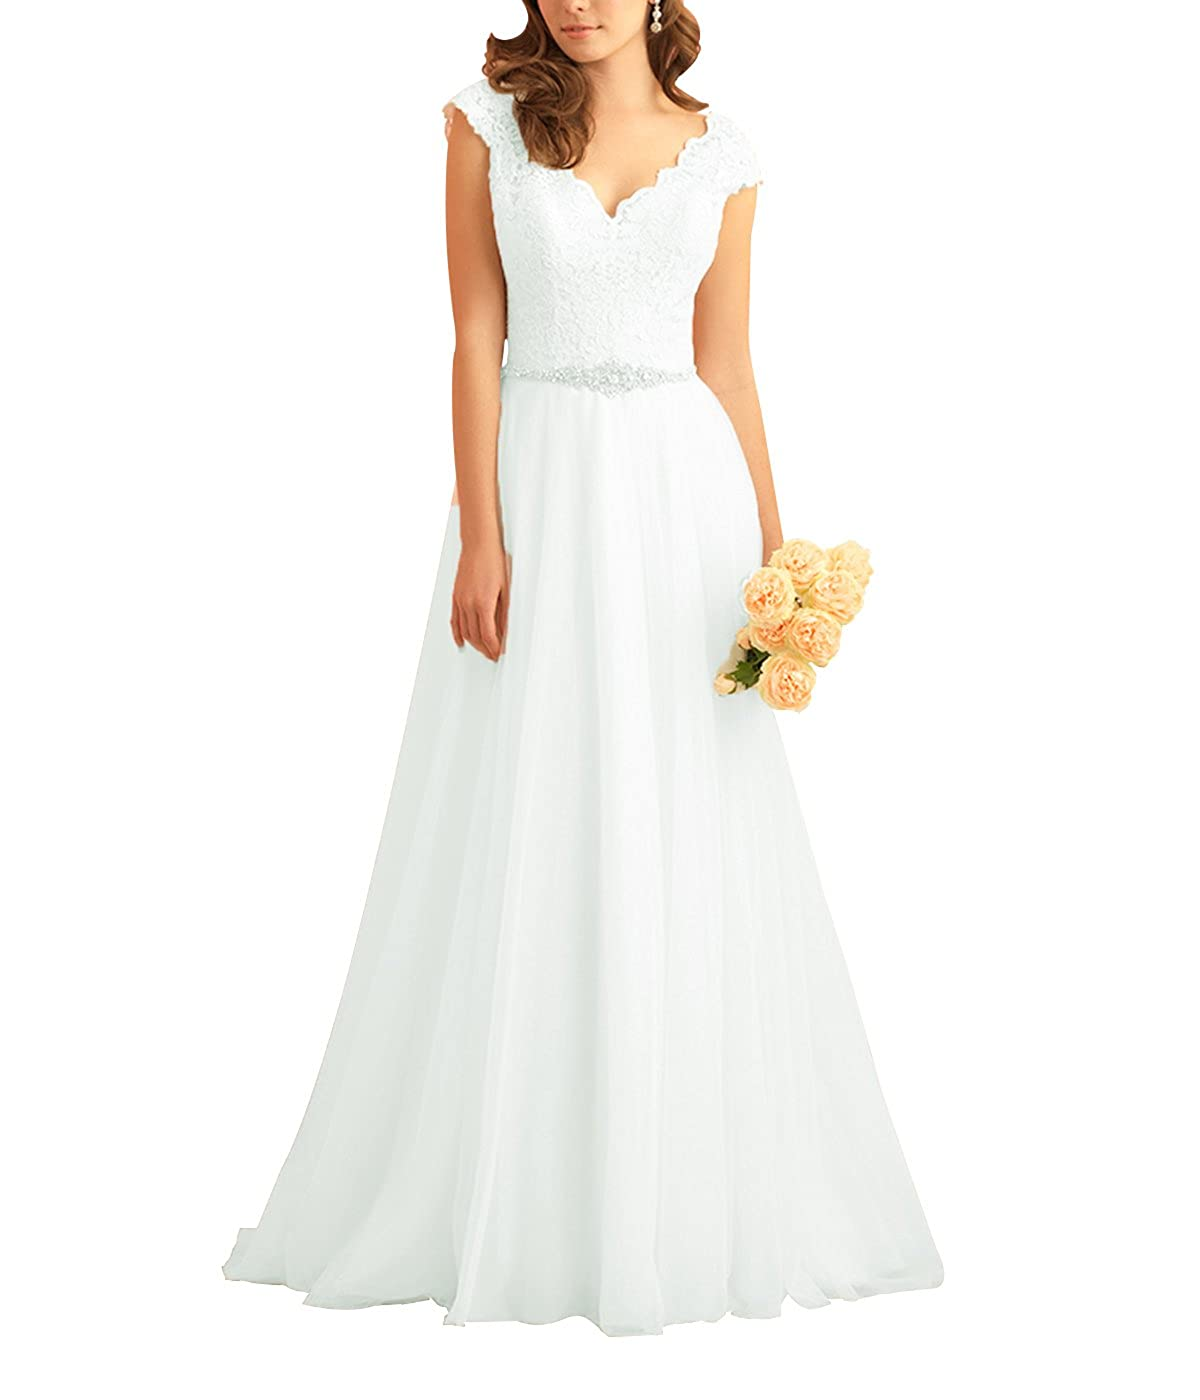 Womens V Neck Cap Sleeve Lace Wedding Dresses Backless Chiffon